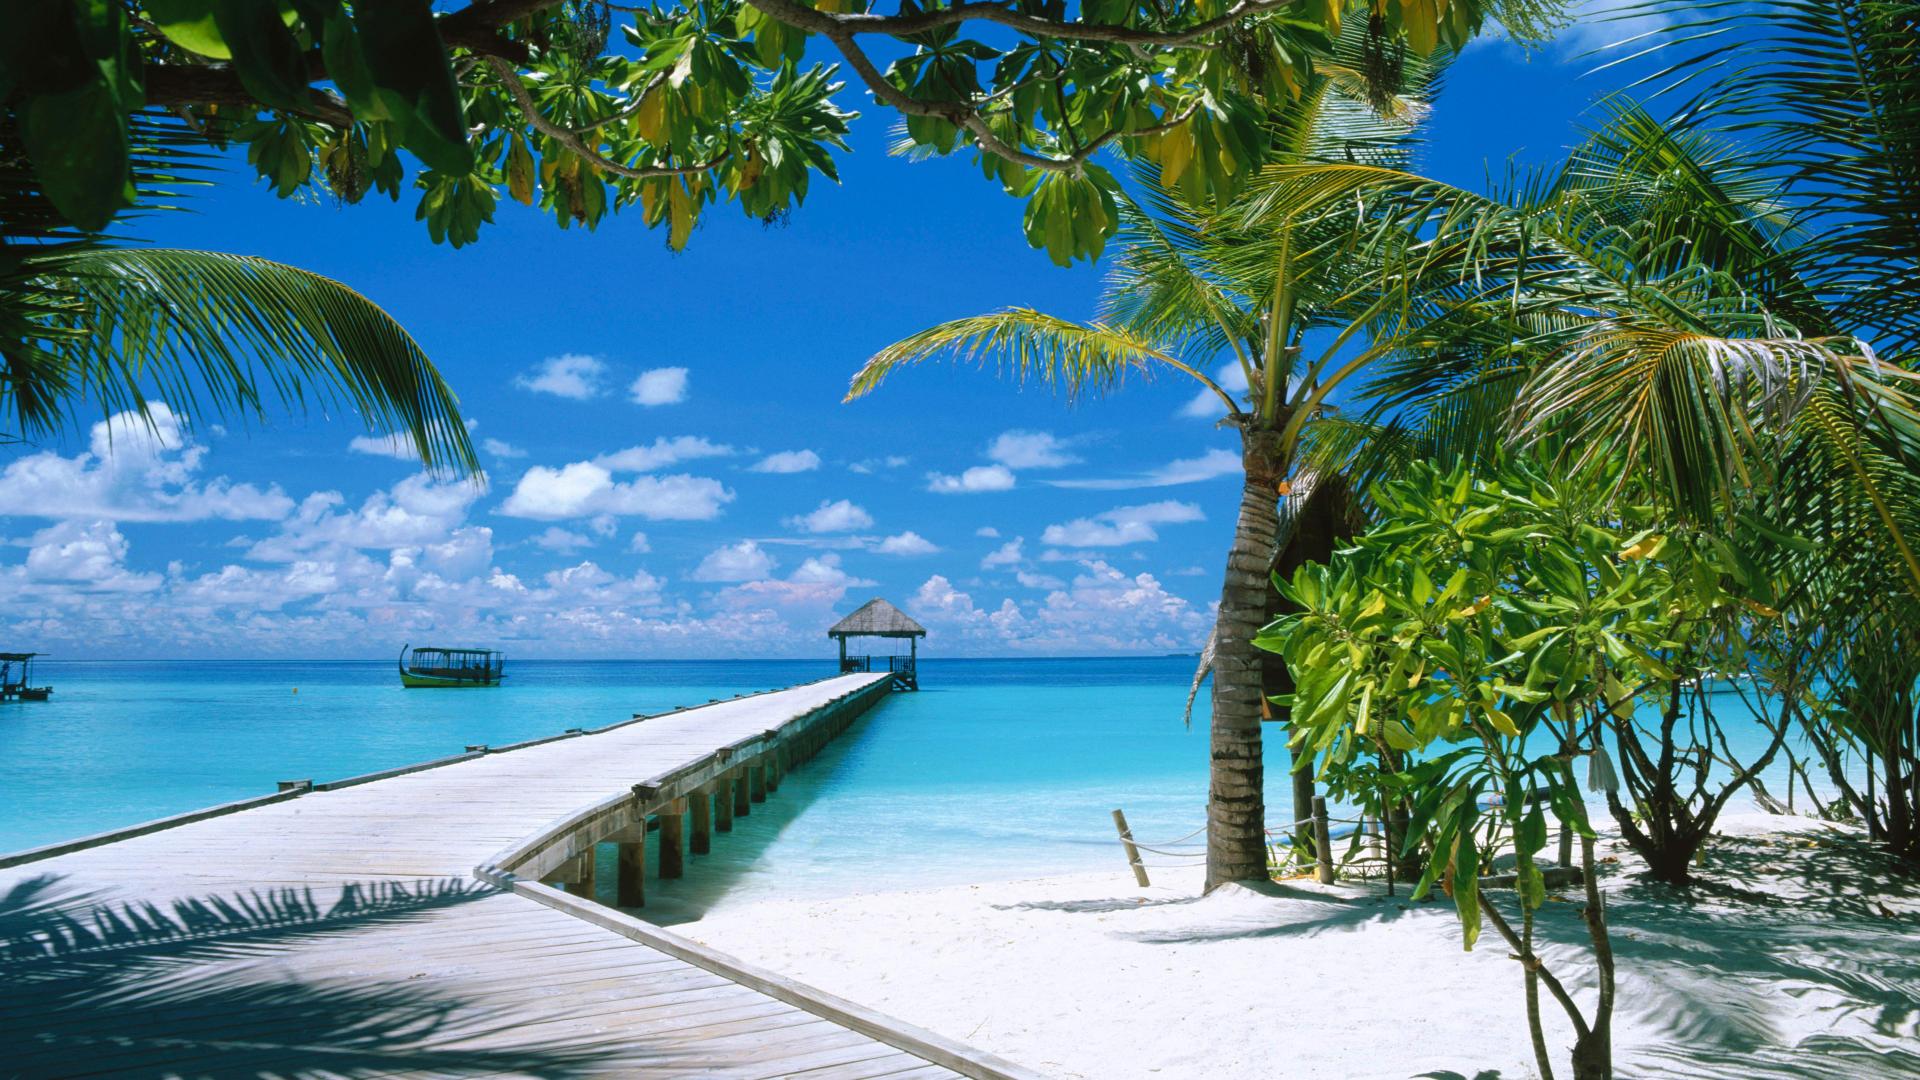 Maldives hd wallpapers desktop backgrounds wallpapersafari for Fond ecran plage gratuit